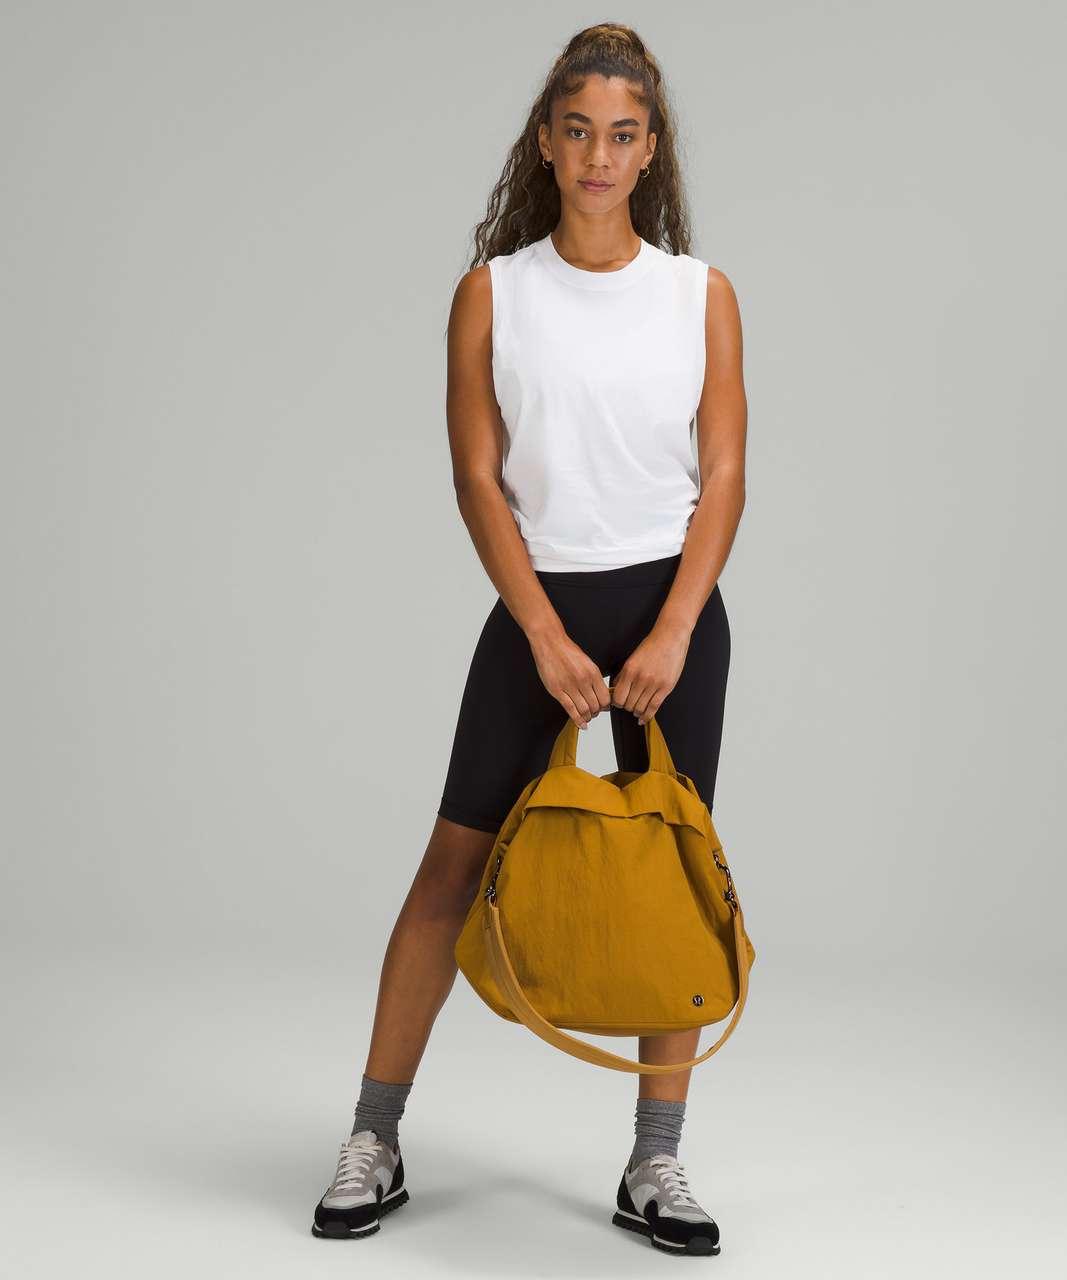 Lululemon On My Level Bag 19L - Gold Spice